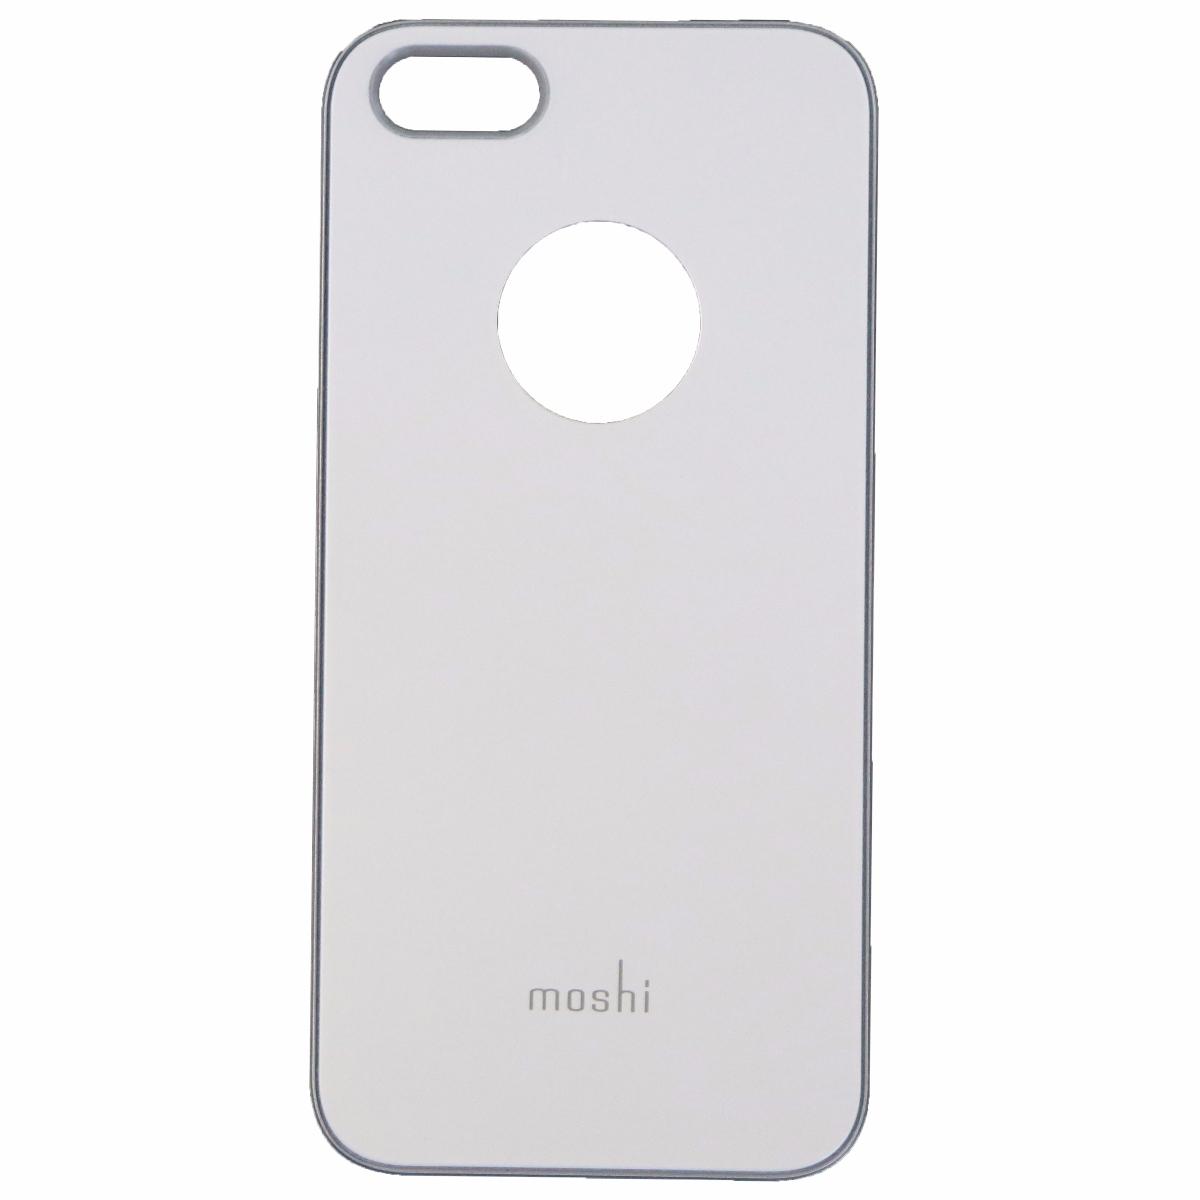 Moshi iGlaze Ultra Slim Protective Case Cover For iPhone 5/5S/SE - White